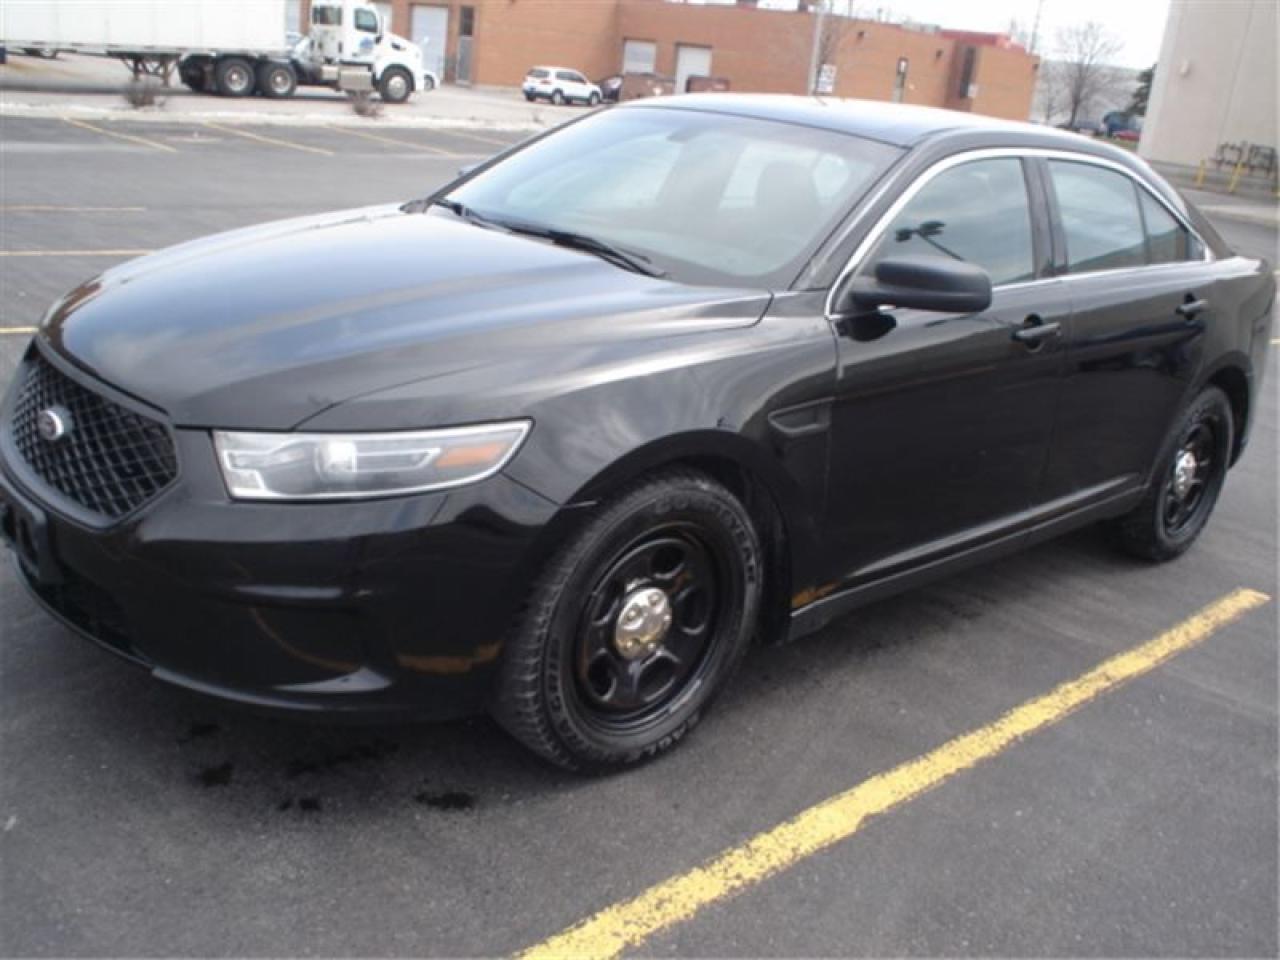 2014 Ford Taurus AWD,BLK/BLK EX POLICE